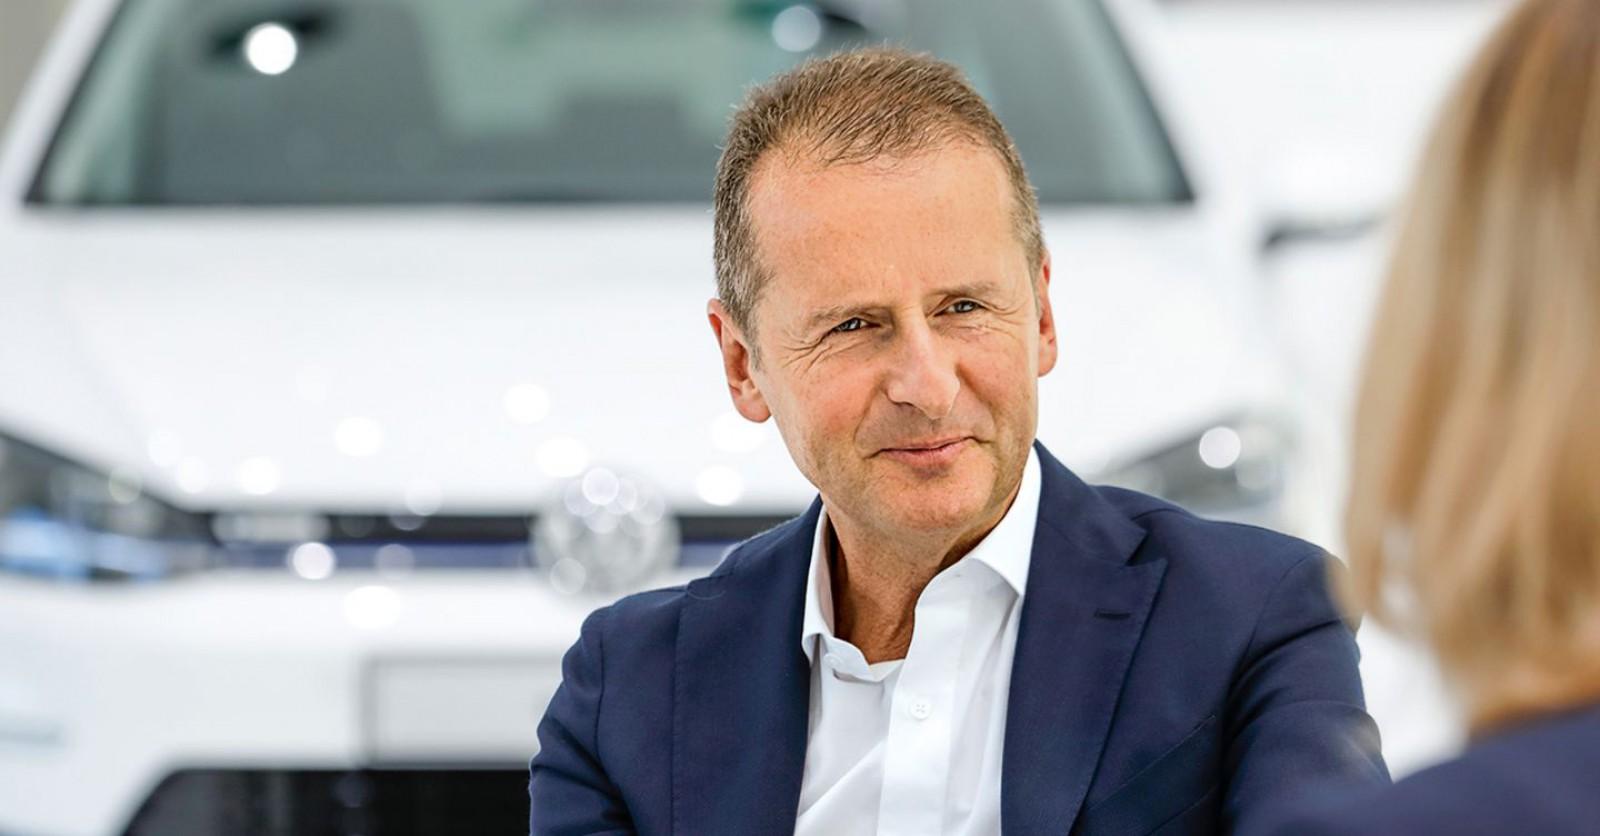 Ultima oră! Şeful VW Herbert Diess a fost numit drept nou director general al Volkswagen Group